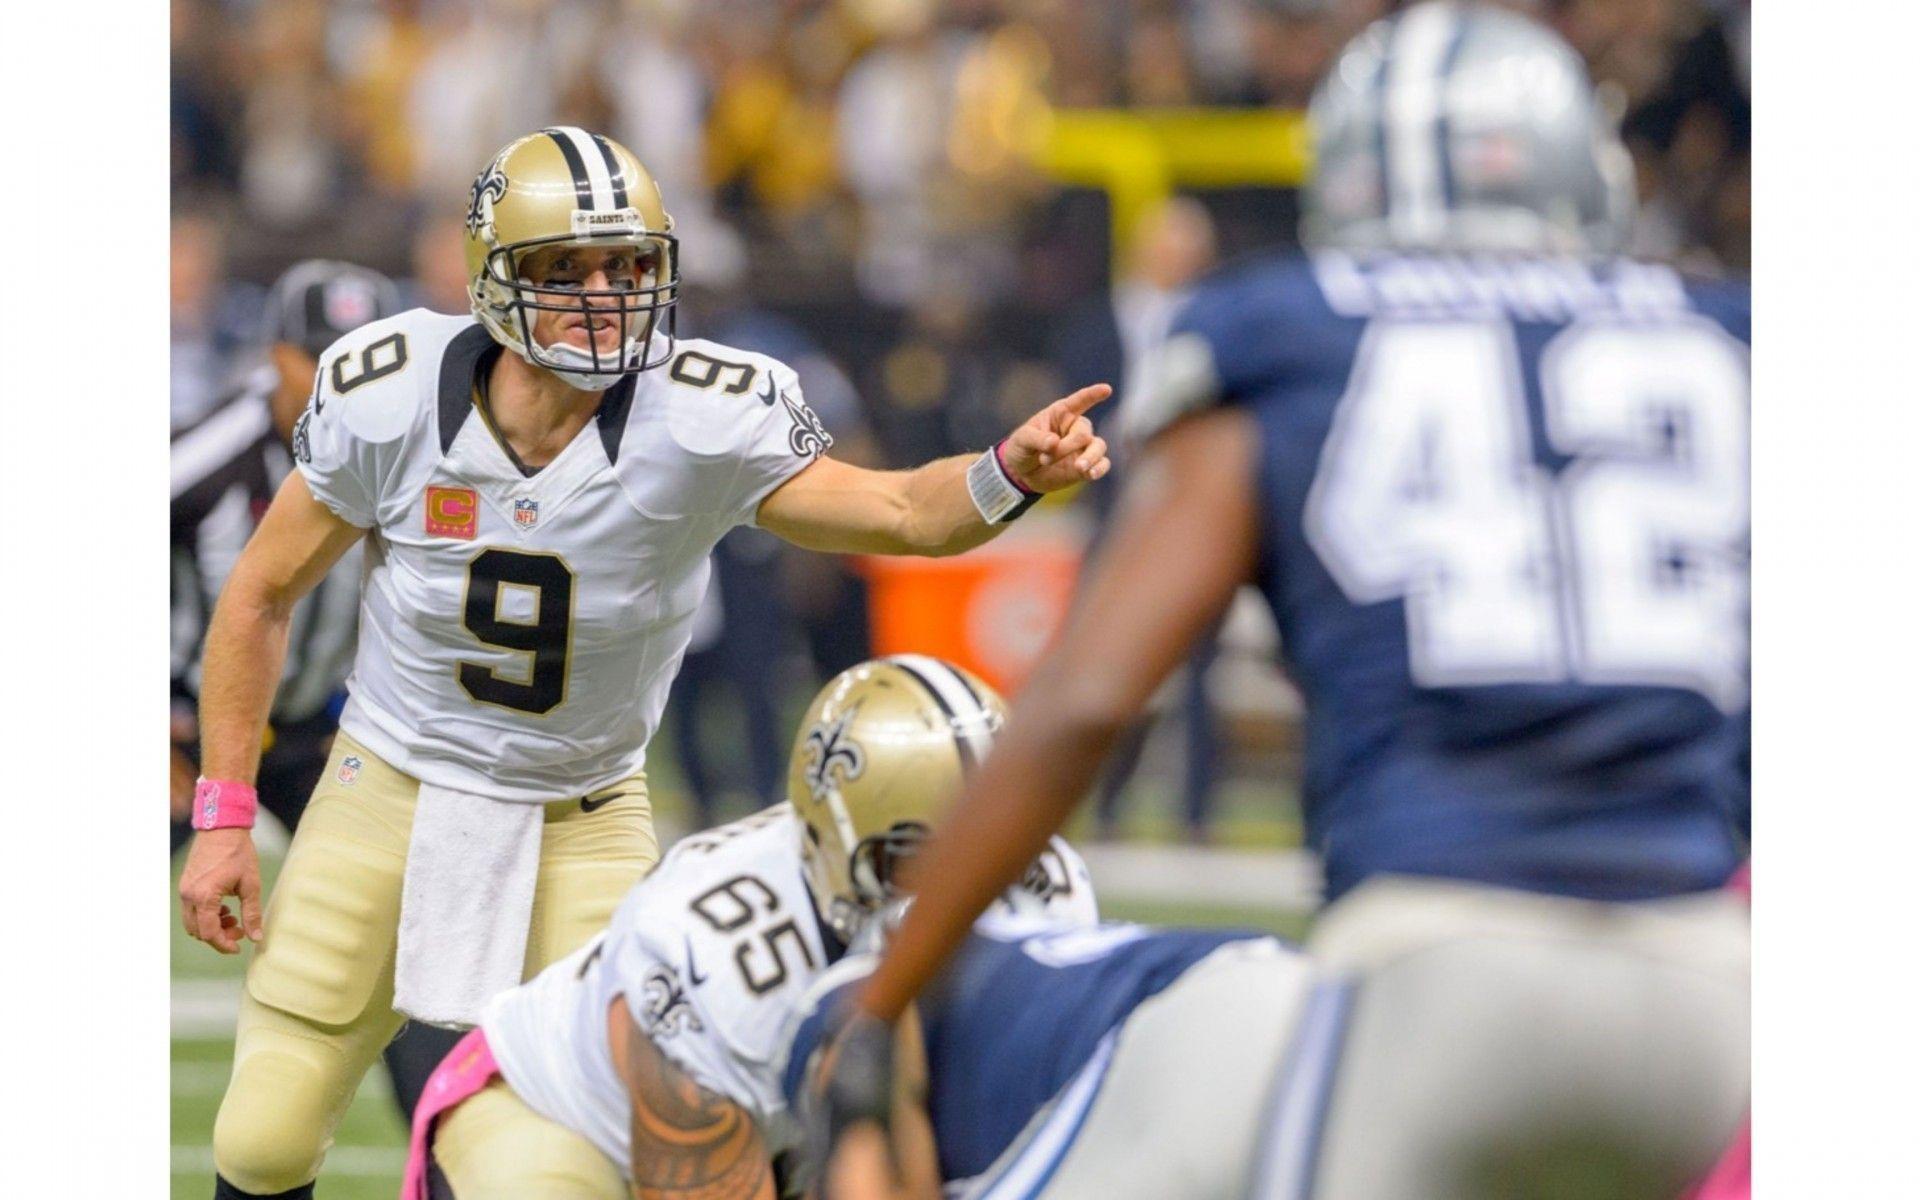 New Orleans Saints 4K Drew Brees Wallpaper | Free 4K Wallpaper